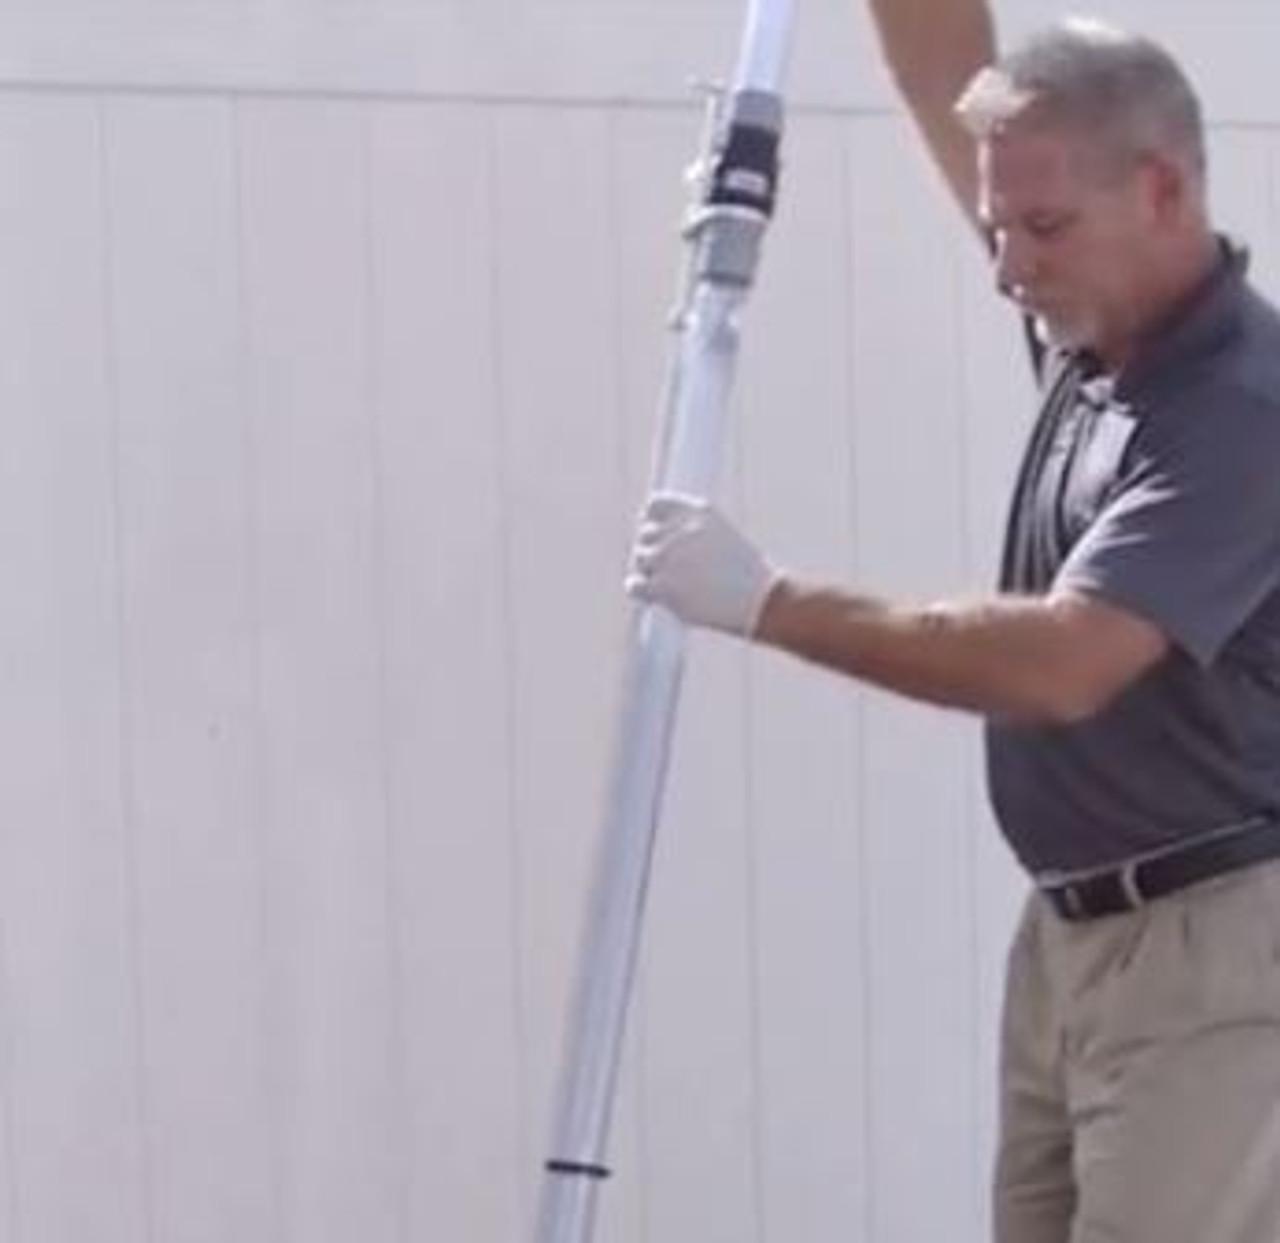 DipStick Pro™ 4 foot Extension